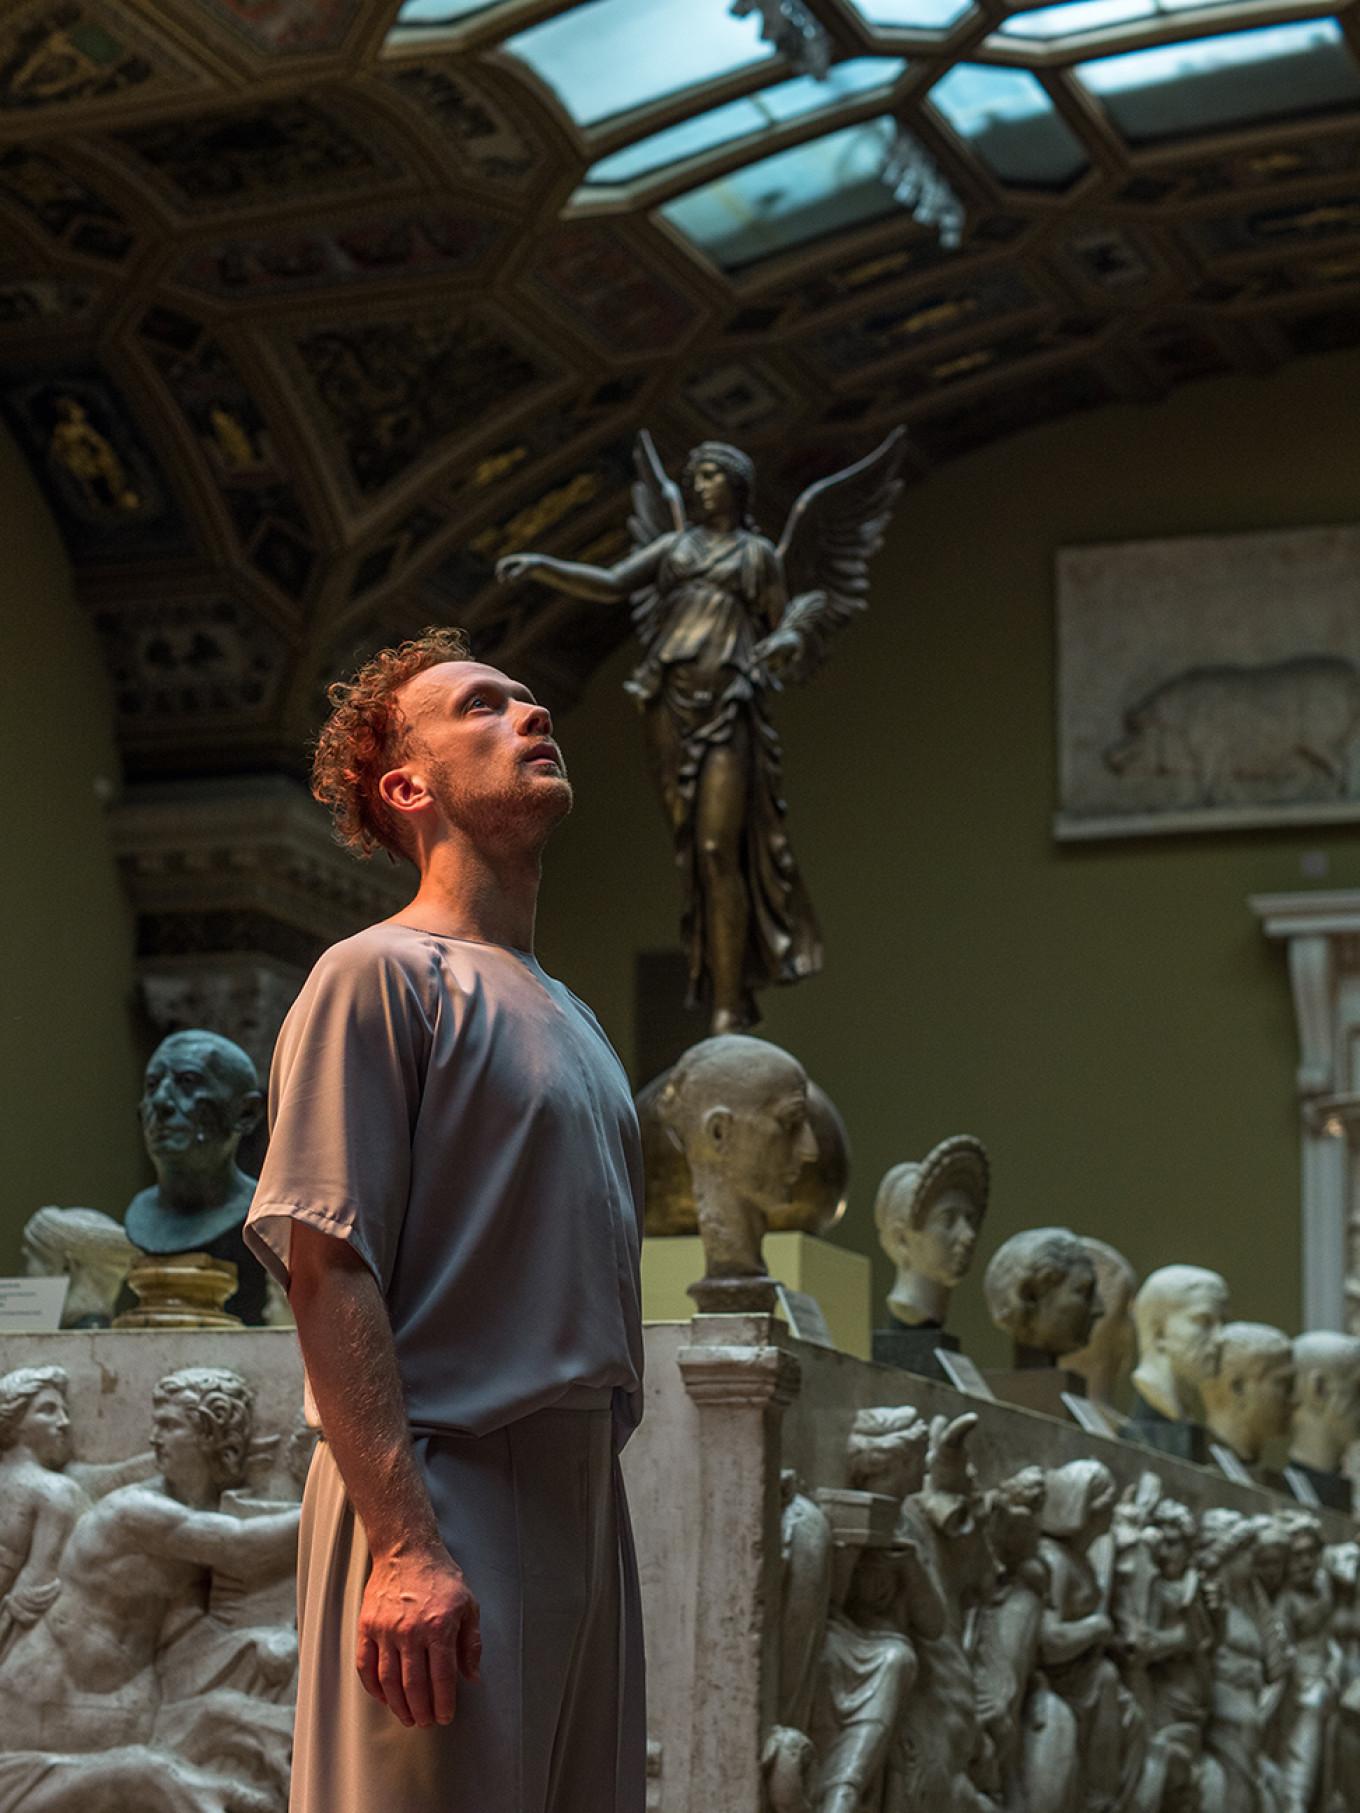 Dancer Ivan Sachkov in the Ancient Rome hall, choreographed by Andrei Korolenko. Julia Kuzkina